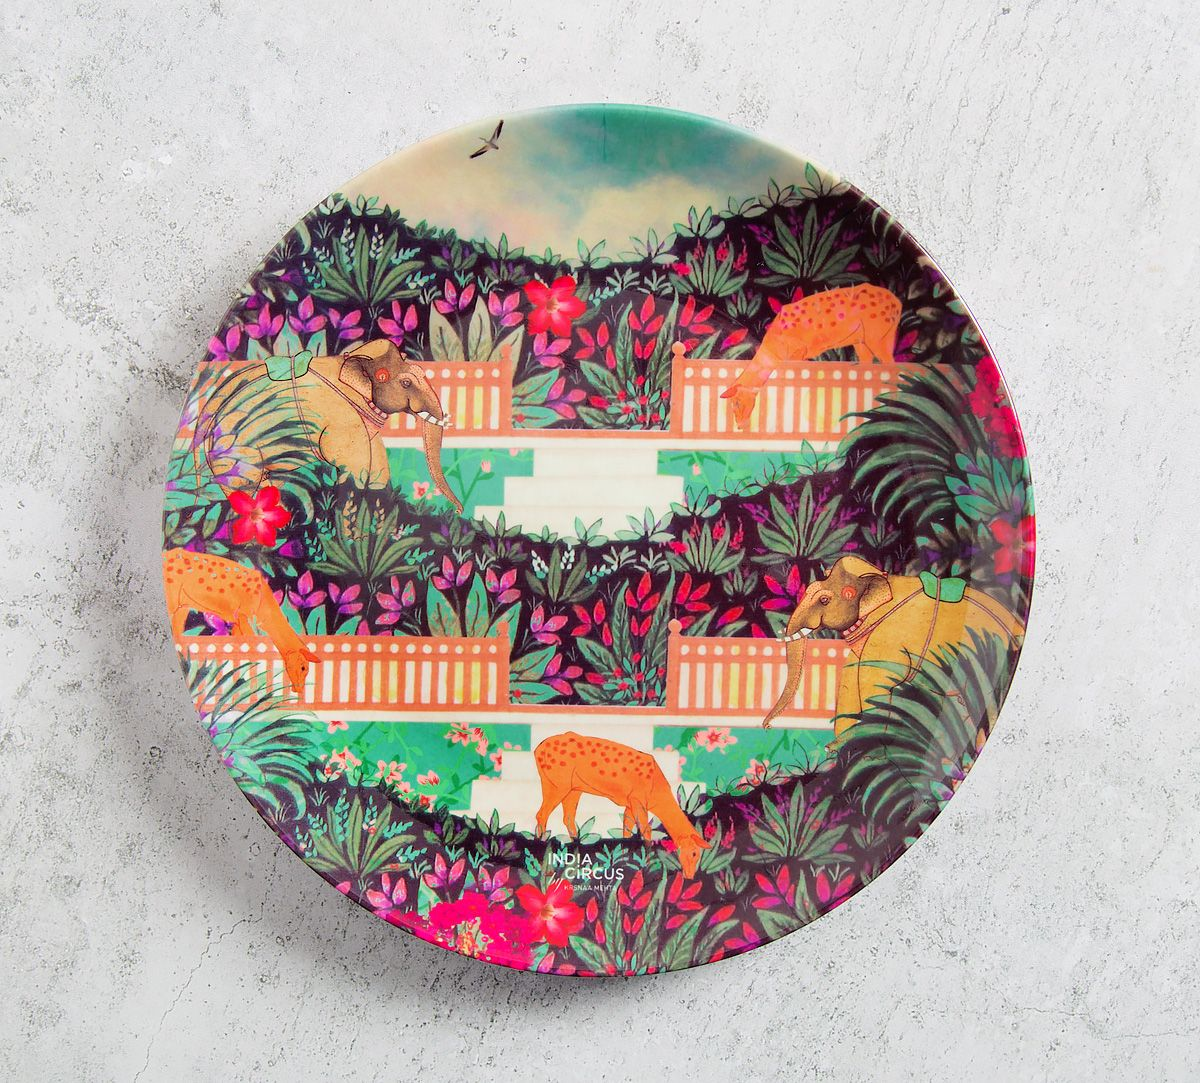 Floors of Flourish 8 inch Decorative and Snacks Platter